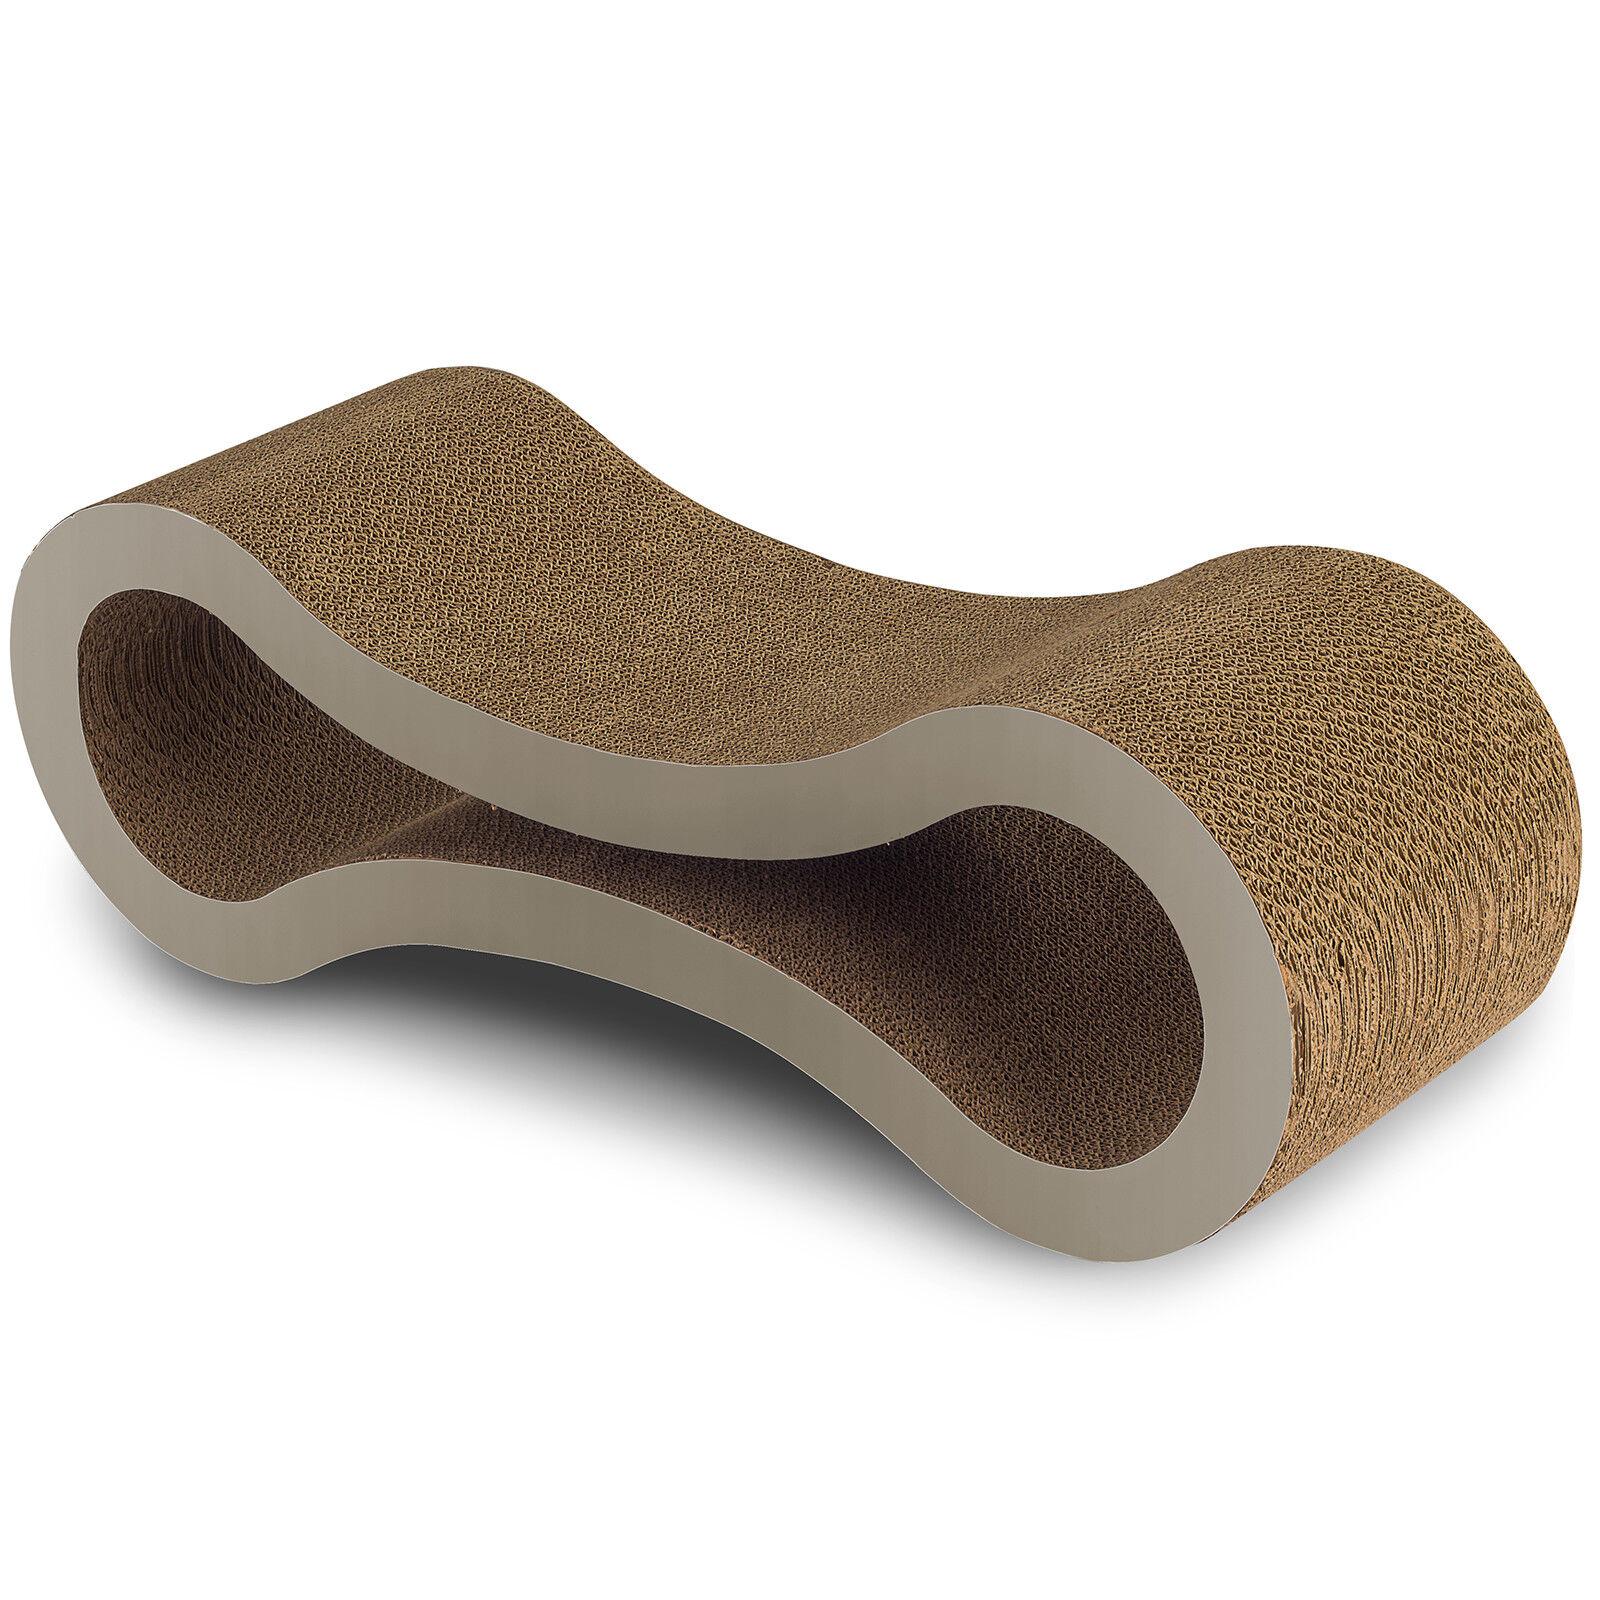 Cat Scratcher Lounge Post Furniture Play Rest Sleep Cardboard with Catnip